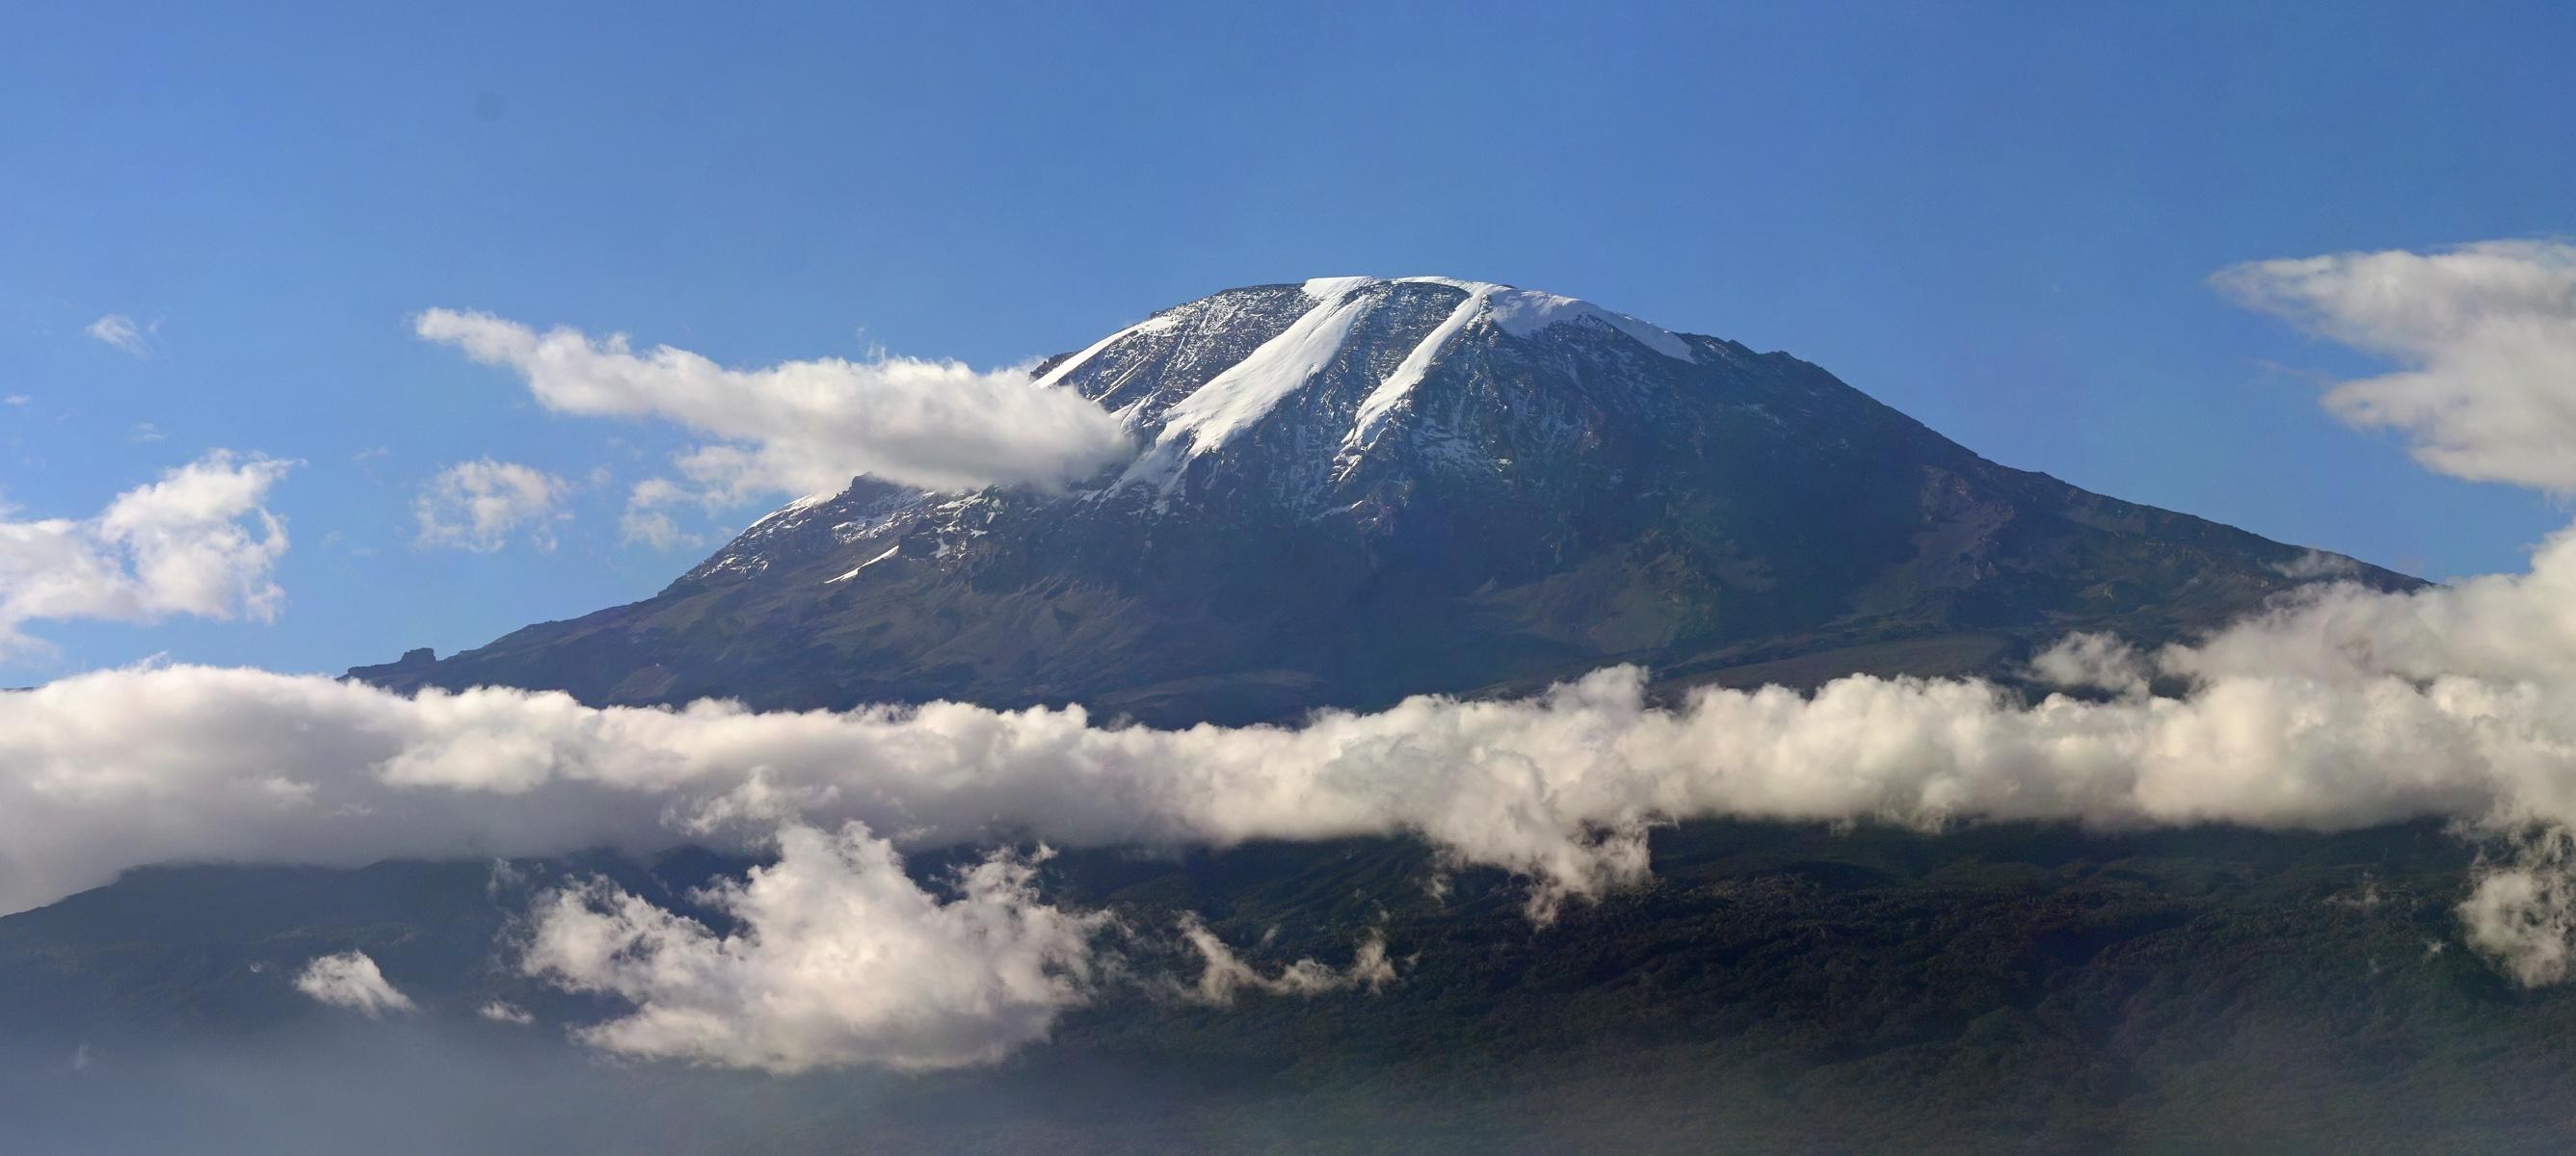 Mount_Kilimanjaro